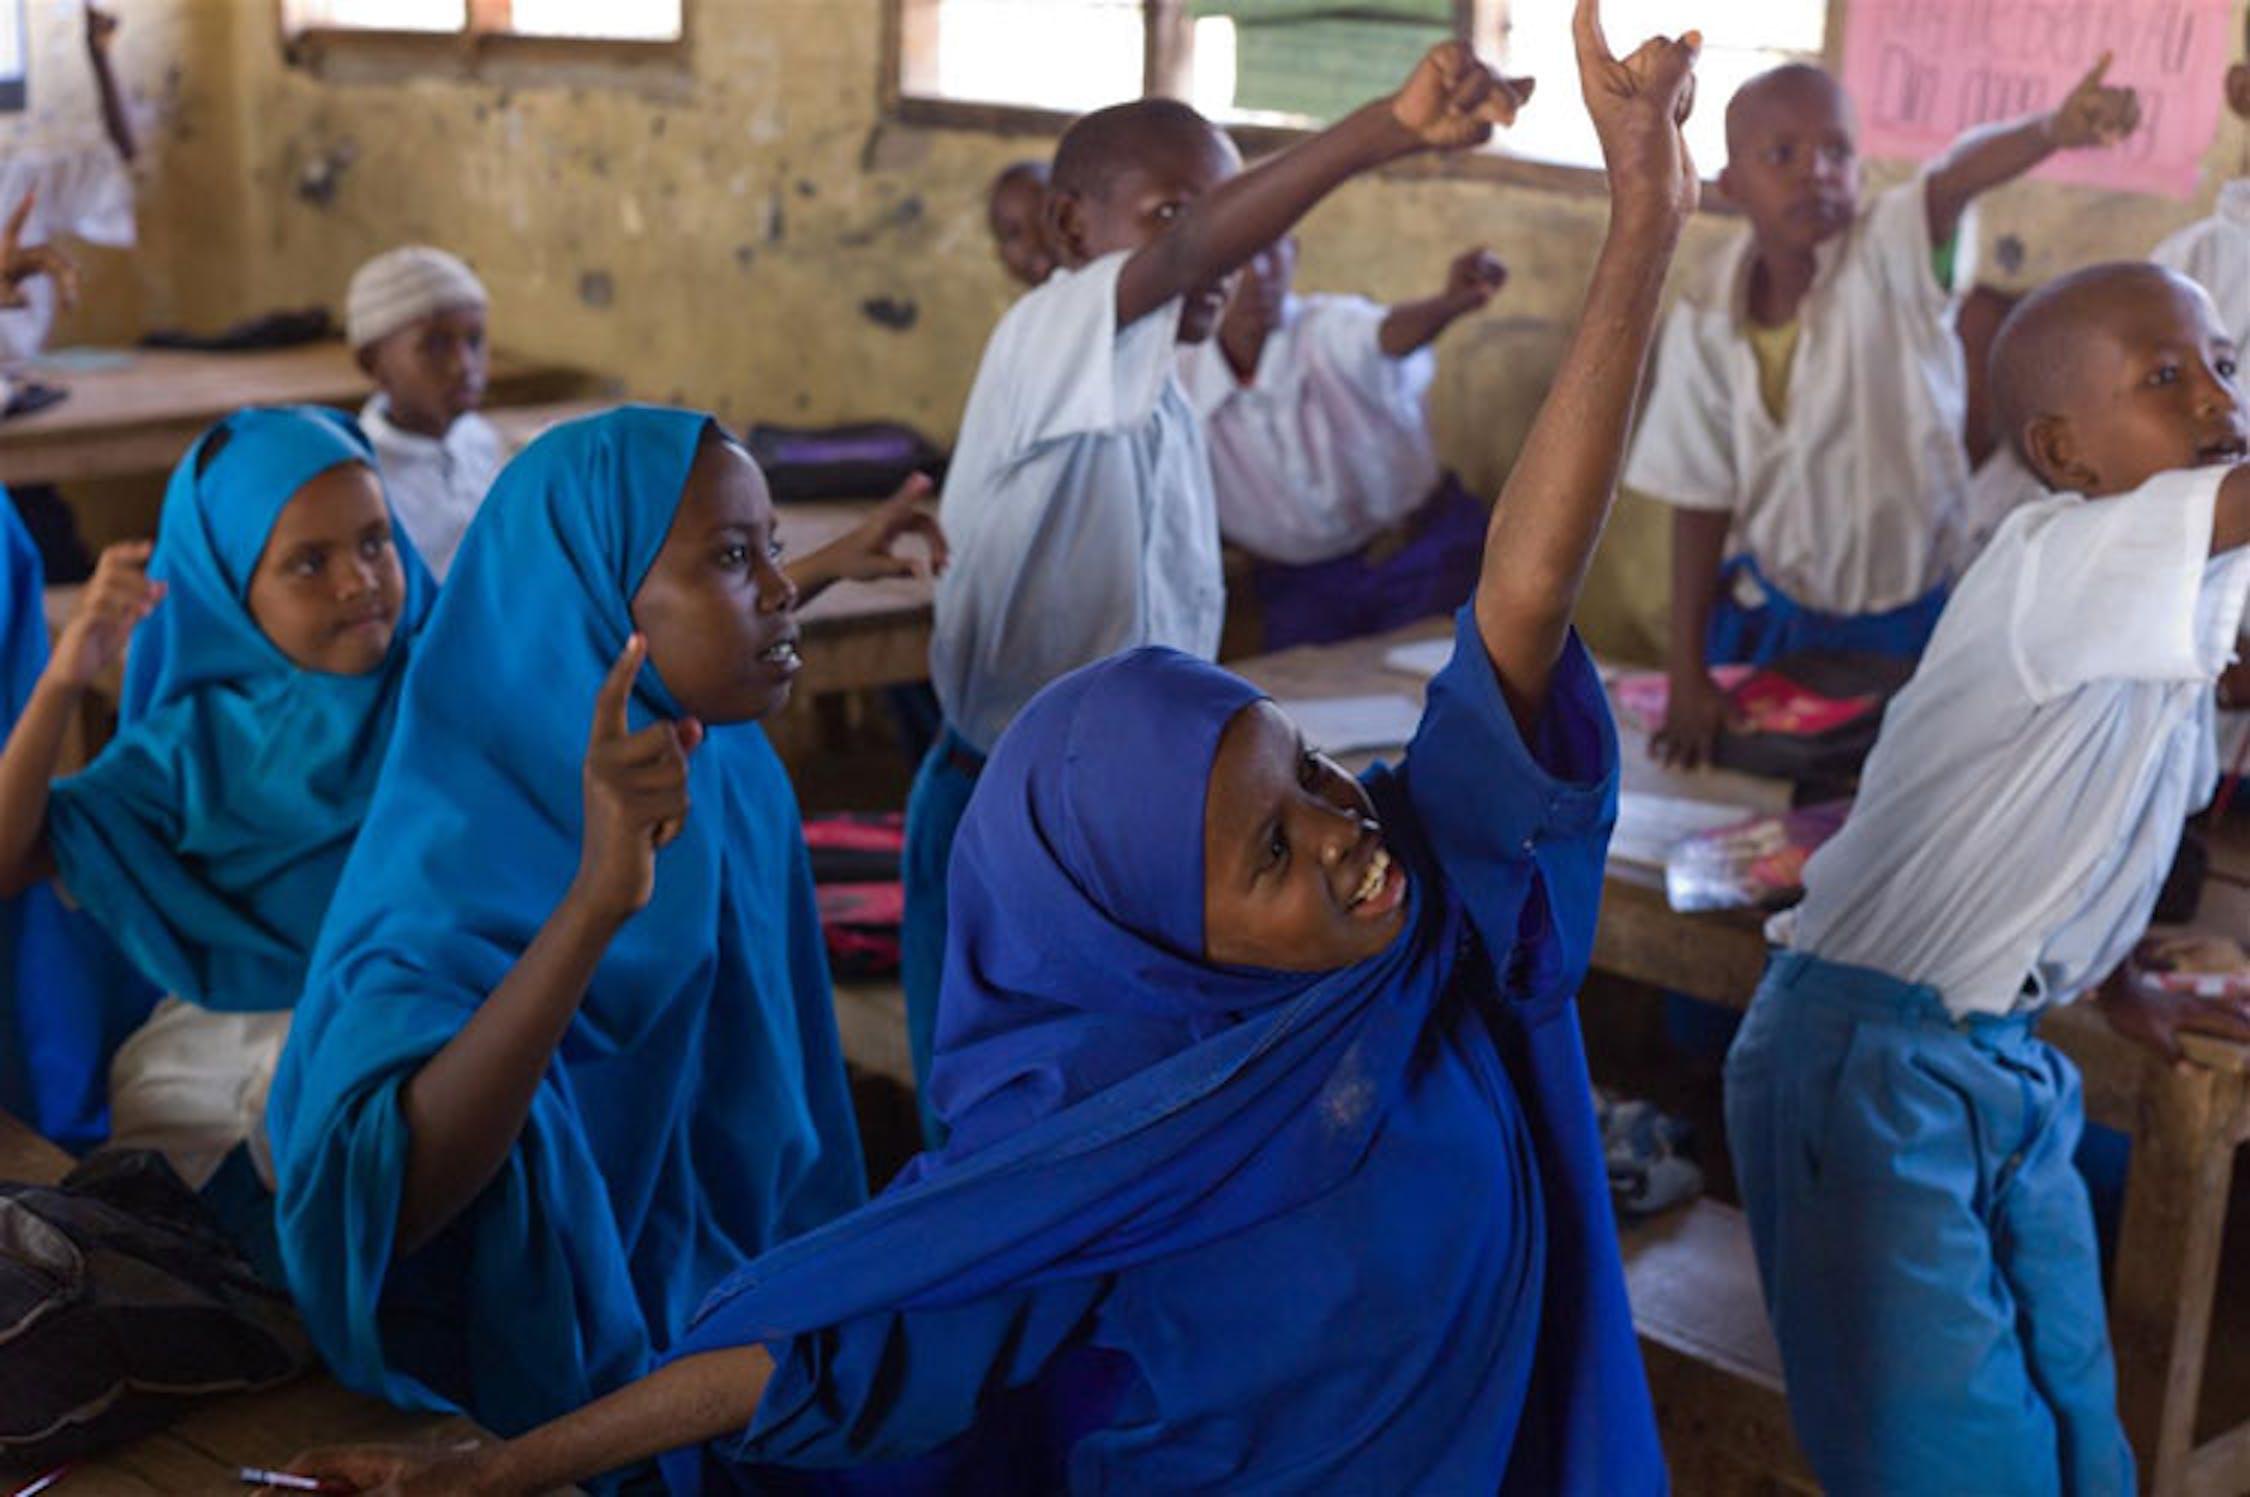 Bambini in una scuola di Garissa, nel Nord-est del Kenya - ©UNICEF Kenya/2011-0079/Nesbitt